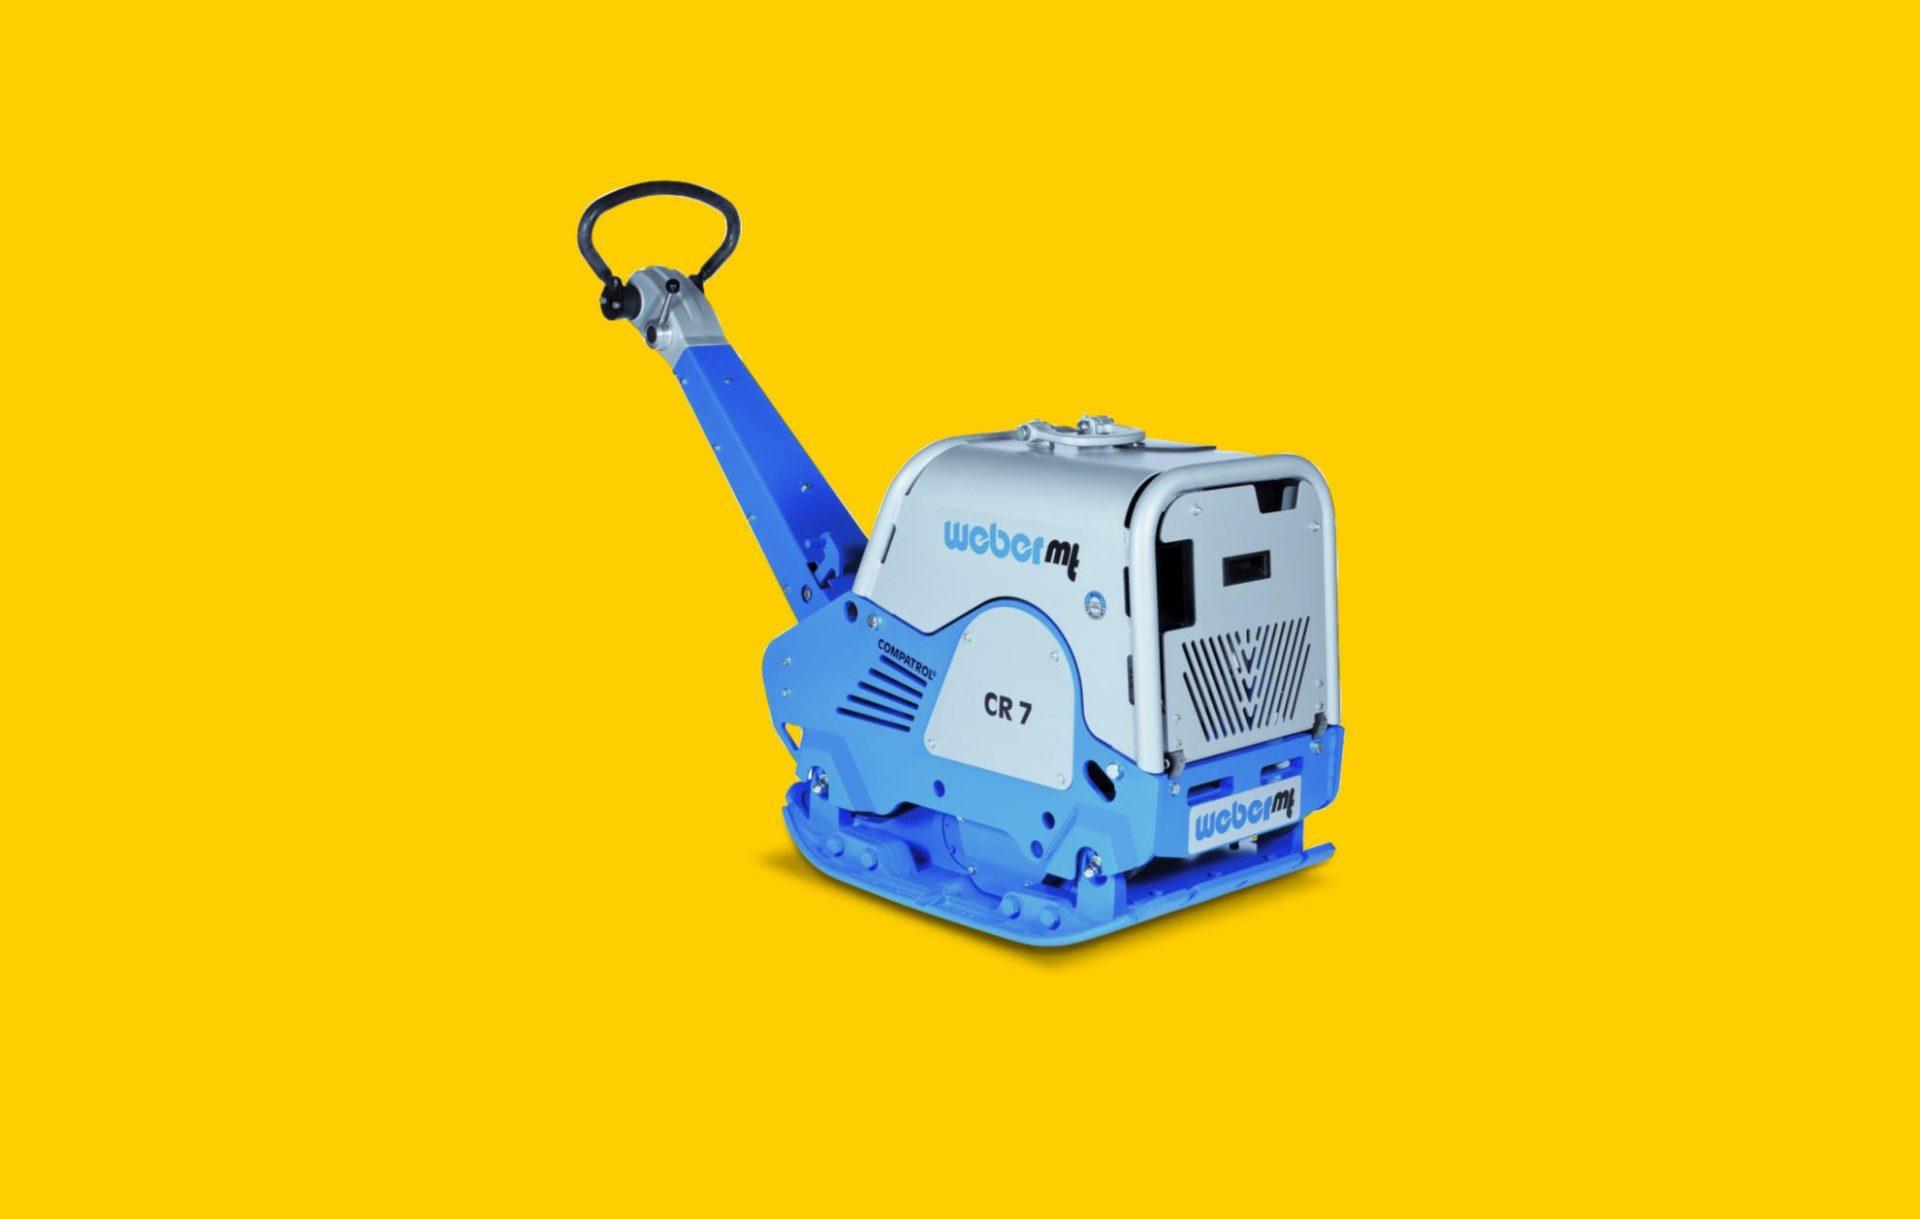 WeberMT handled machines for soil compaction